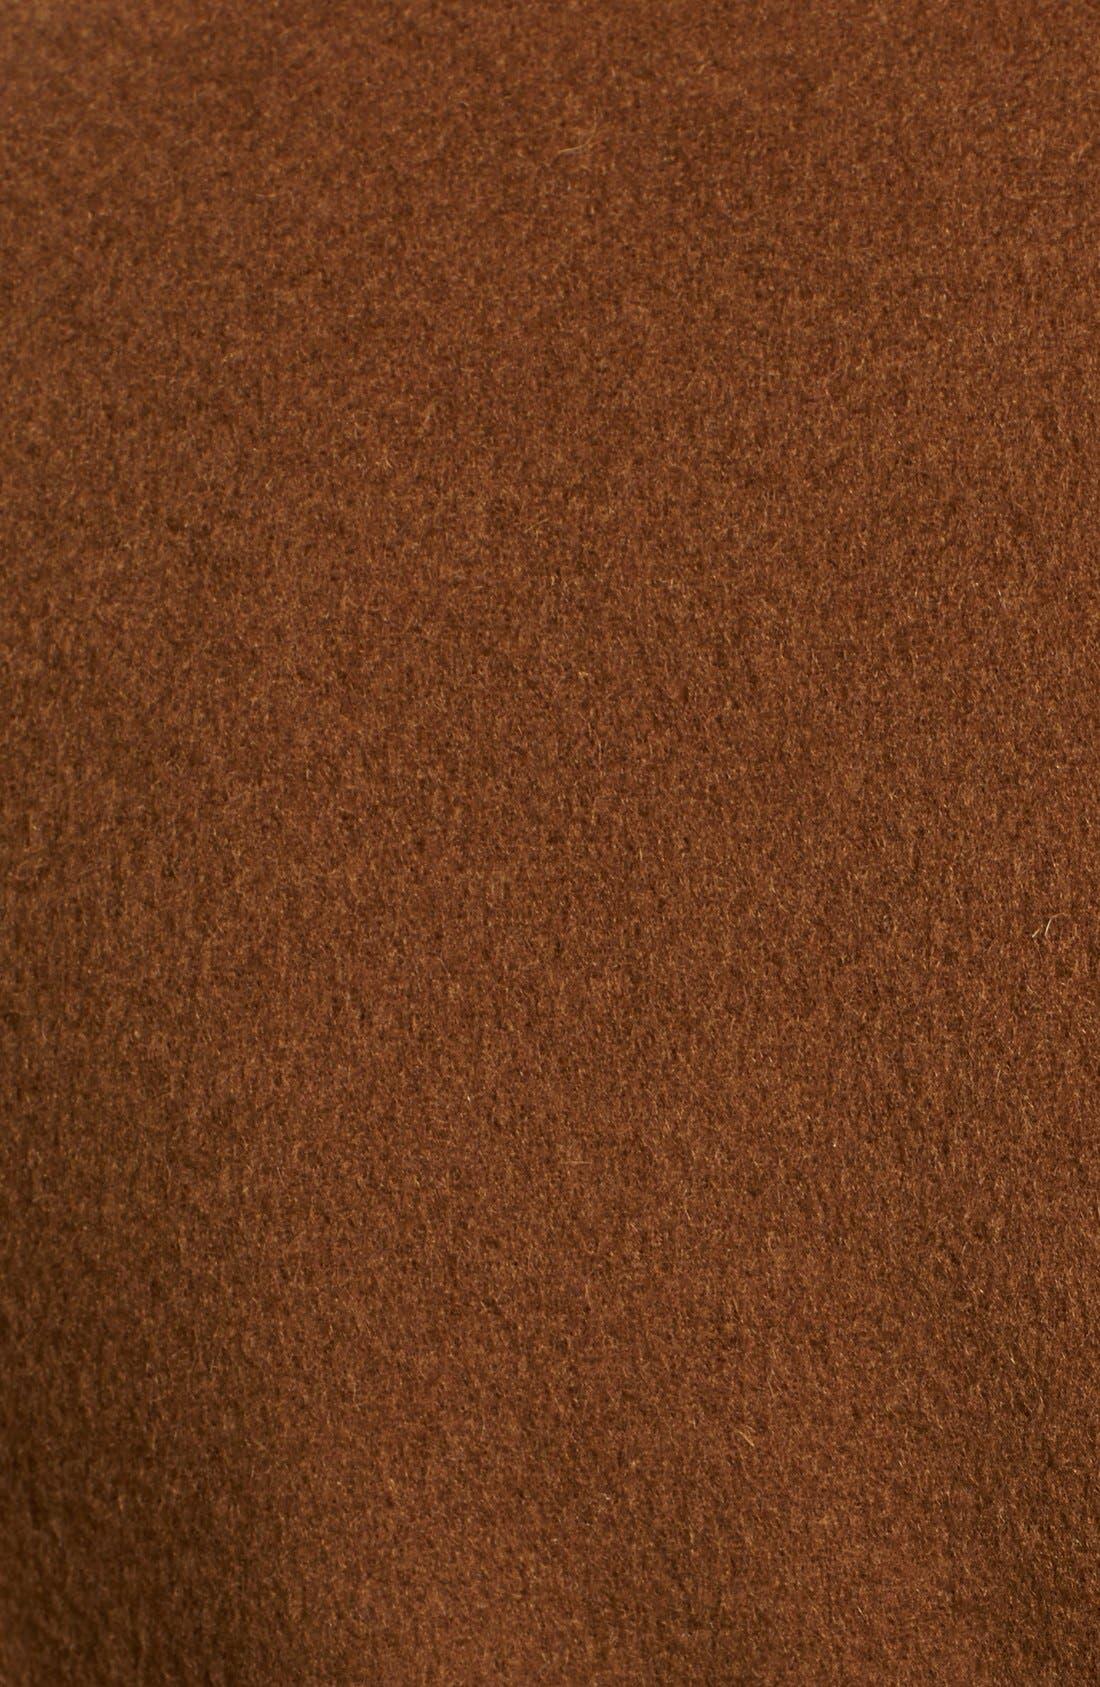 Donna Karan Collection Belted Cashmere Wrap Coat,                             Alternate thumbnail 3, color,                             930